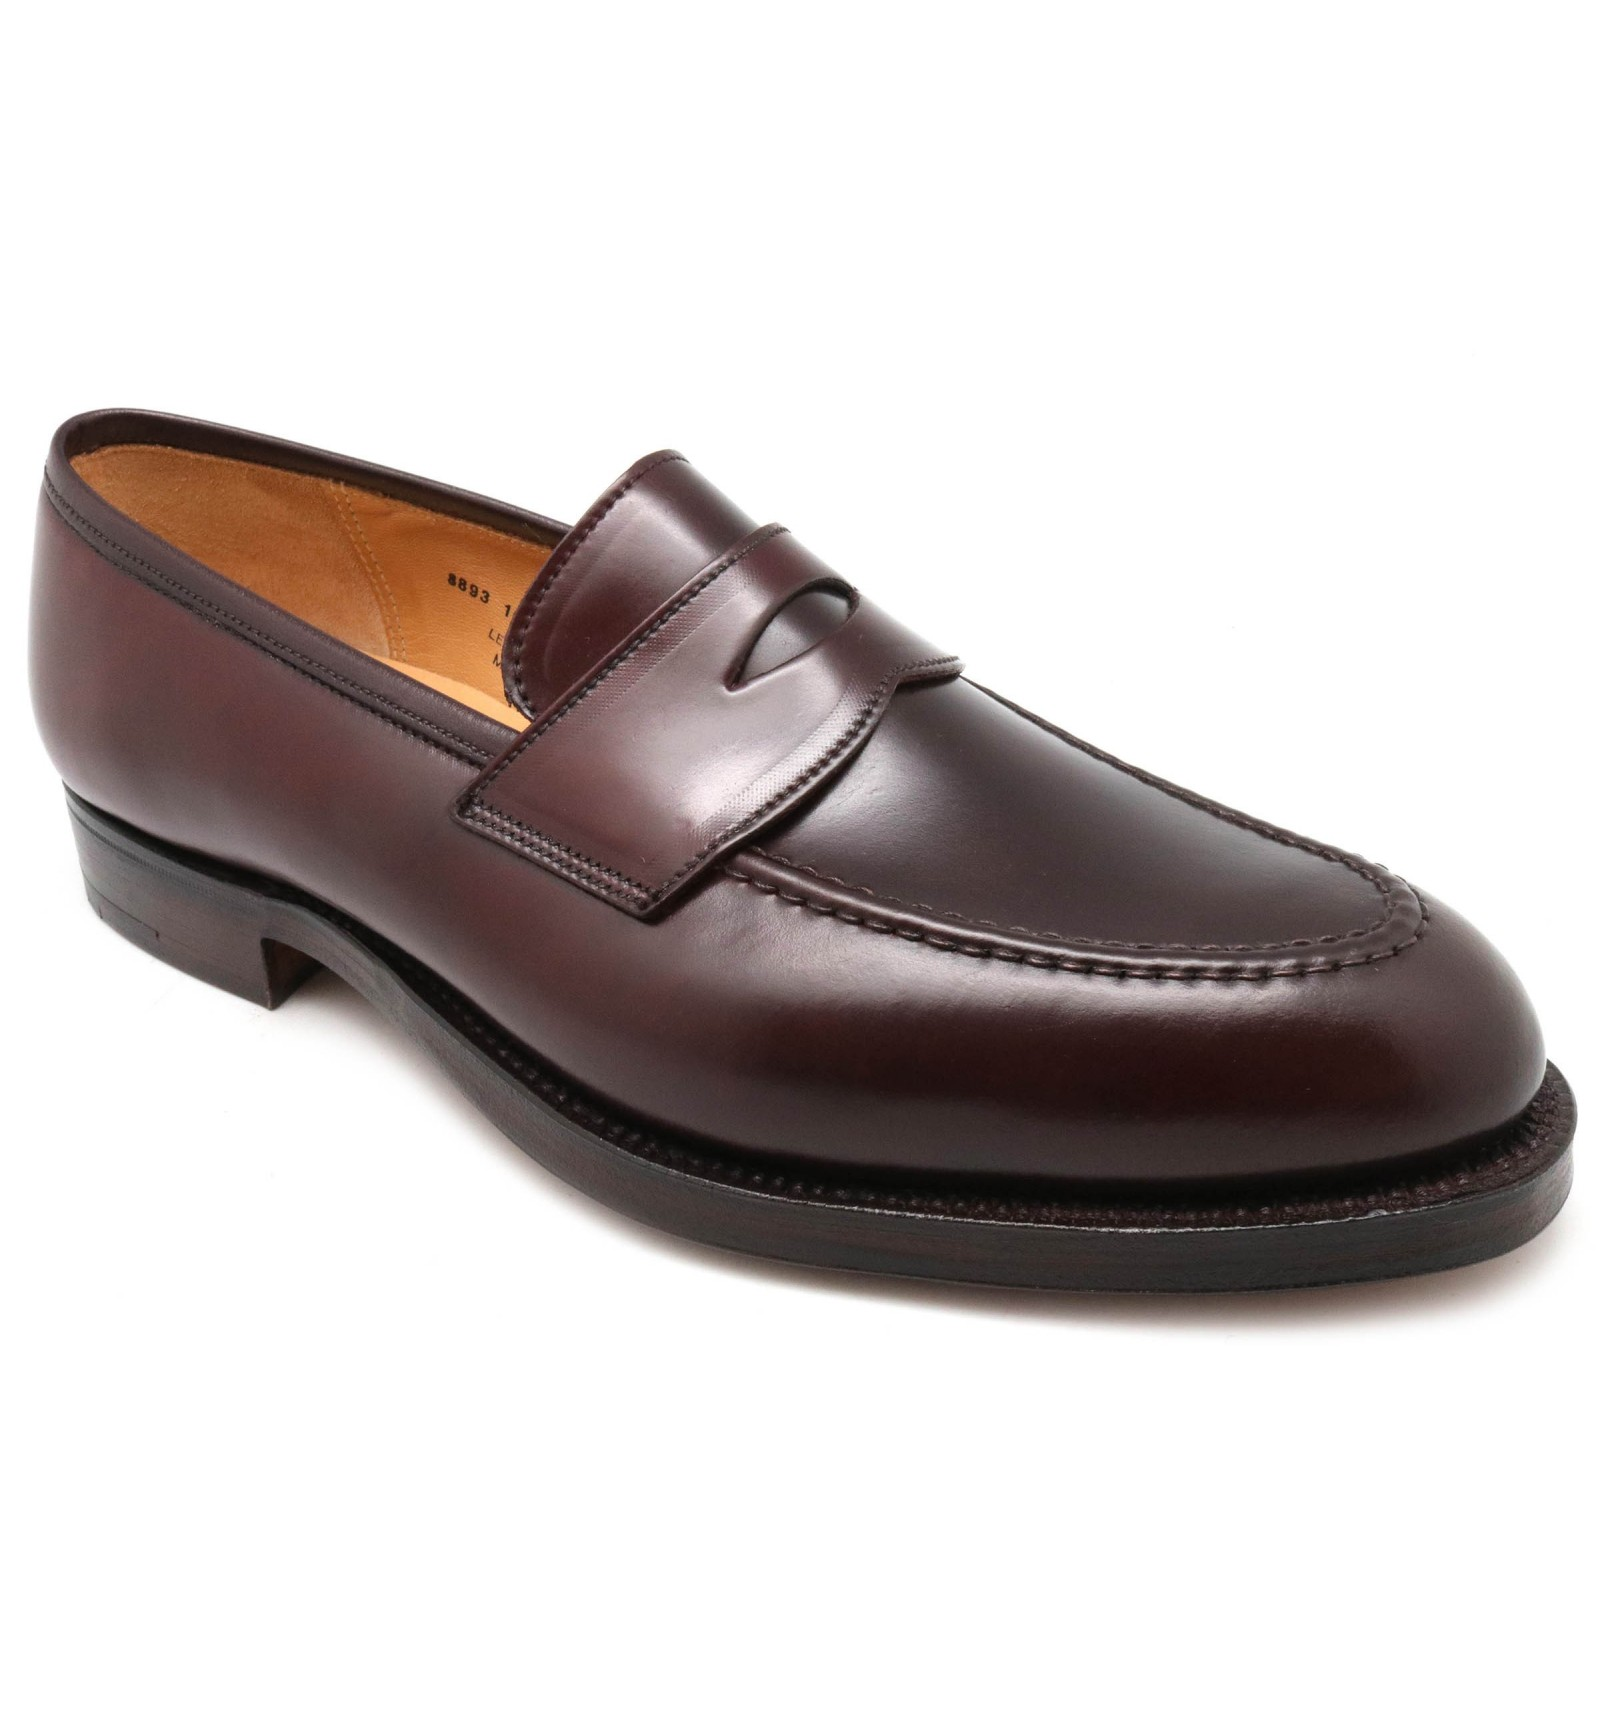 Zapatos Cordovan Henley Crockett Amp Jones